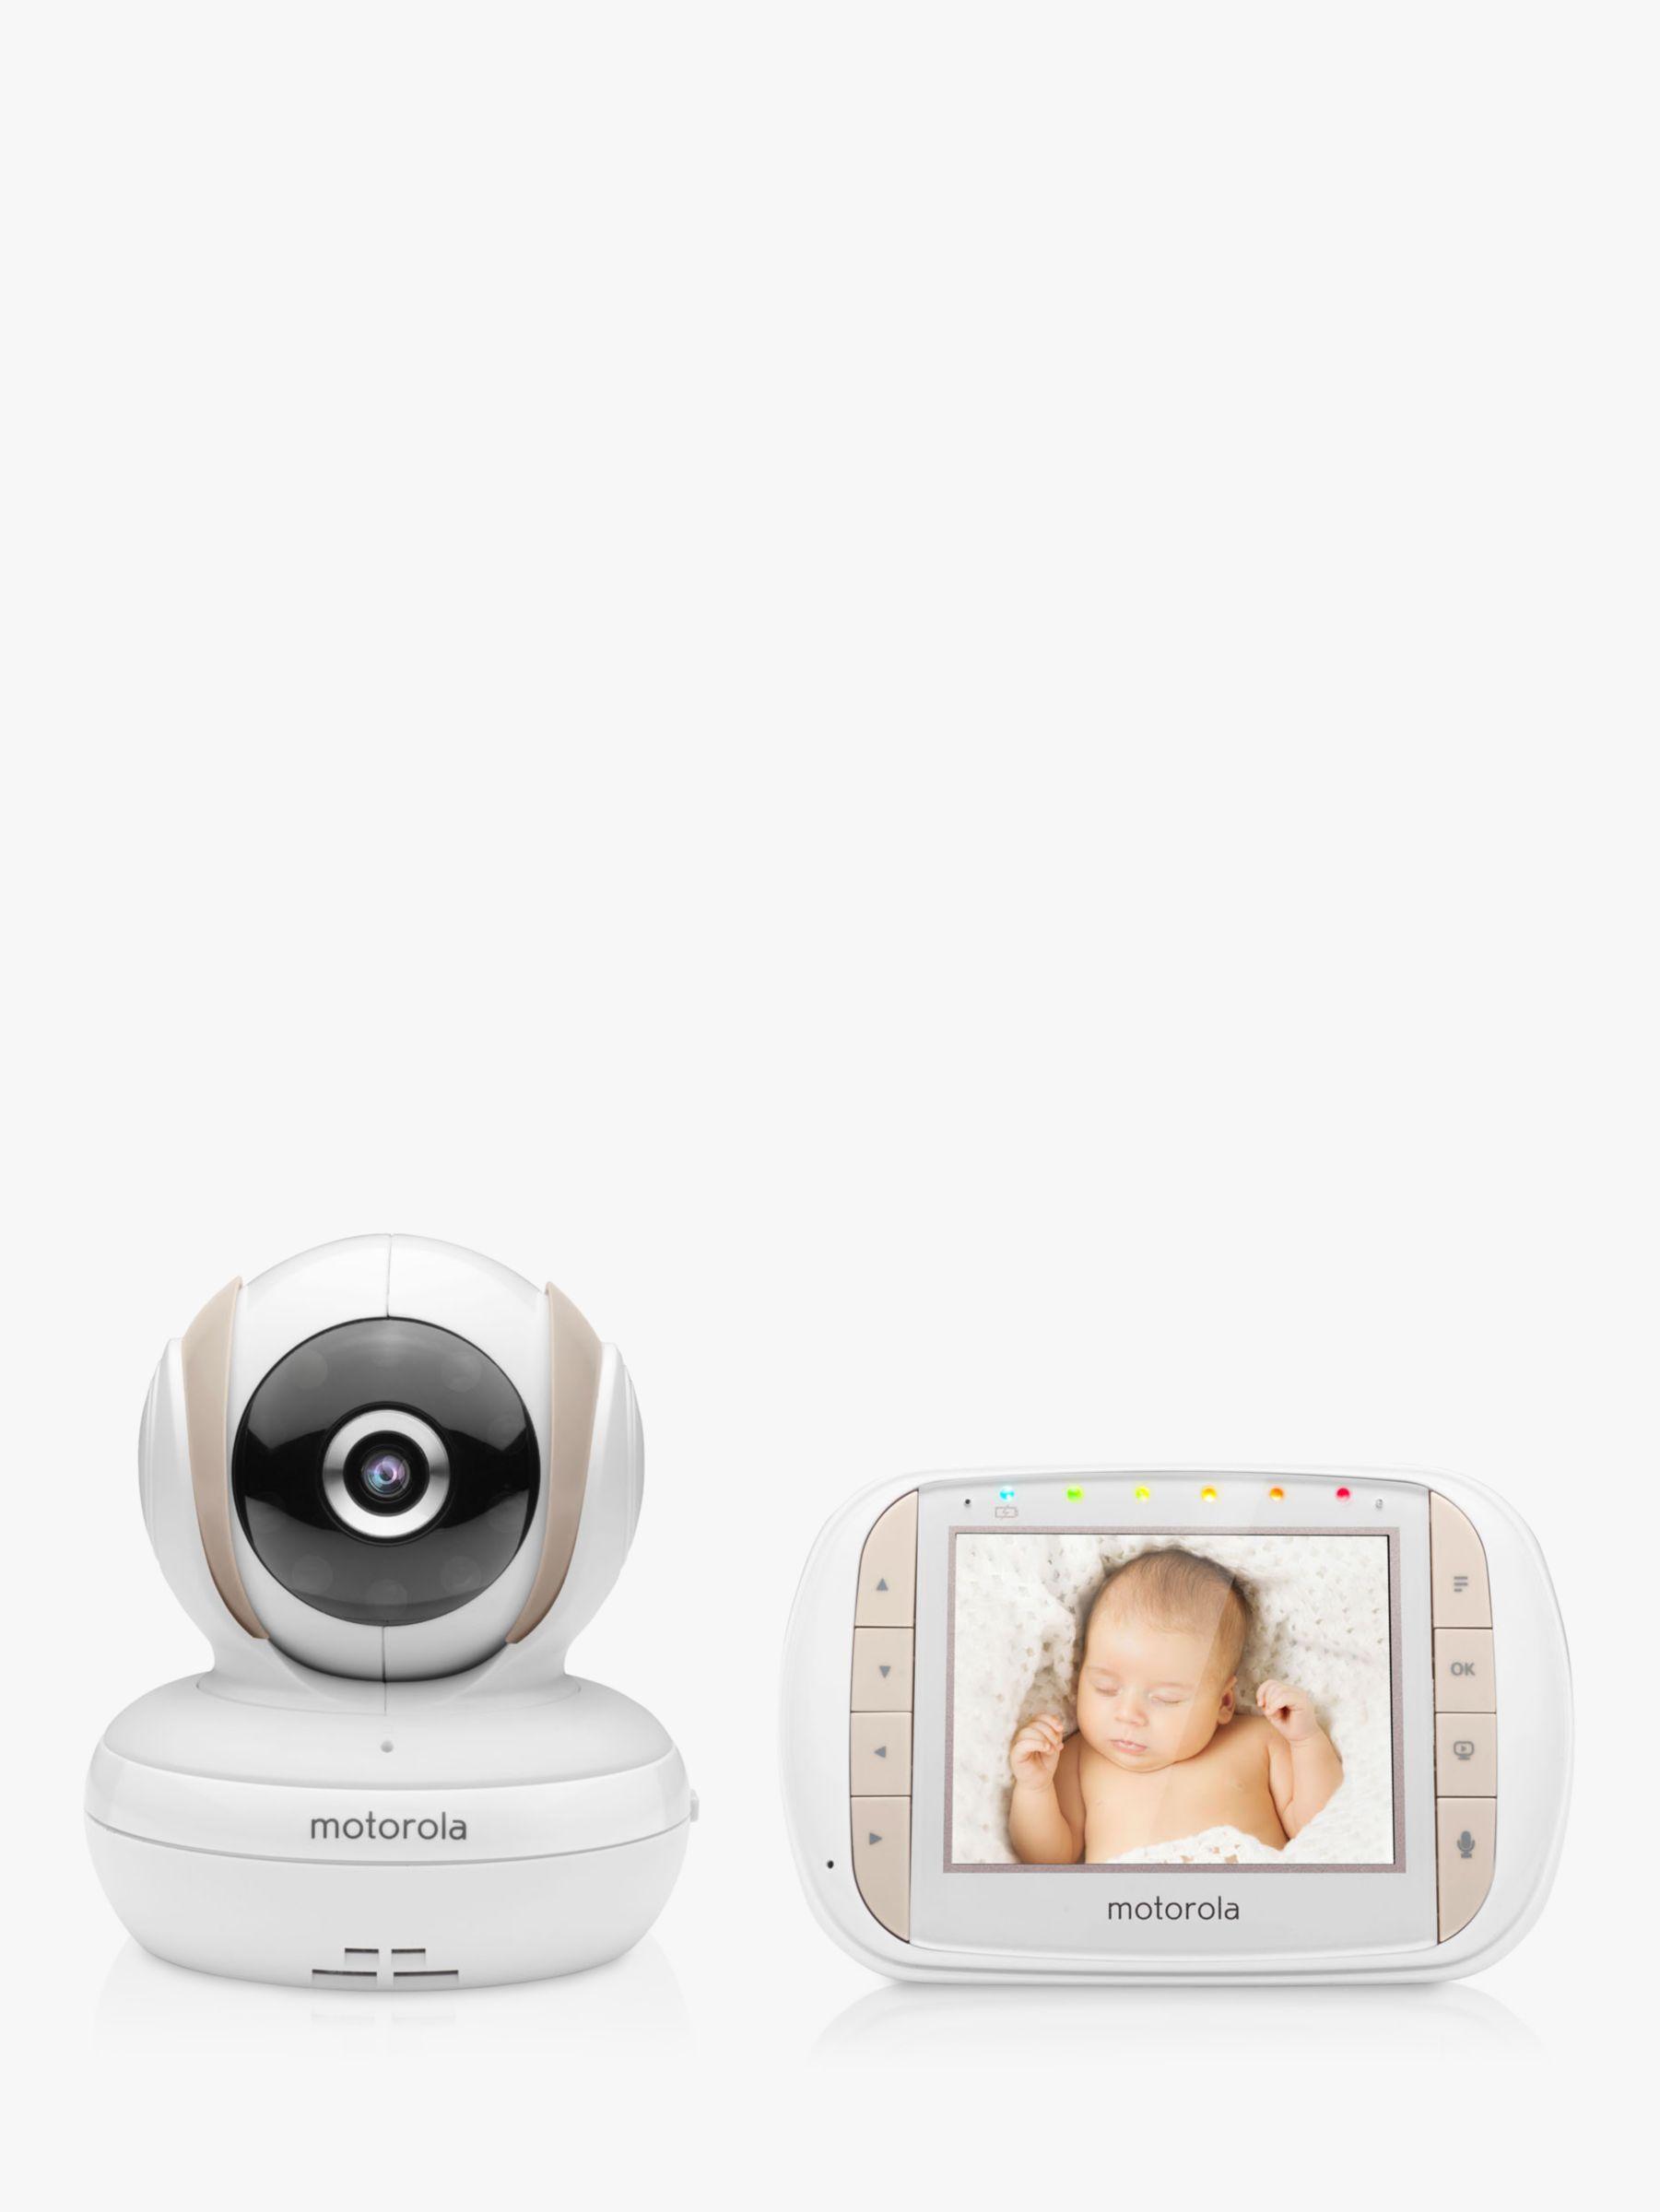 Motorola Motorola MBP35XLC Digital Audio and Video Baby Monitor, White